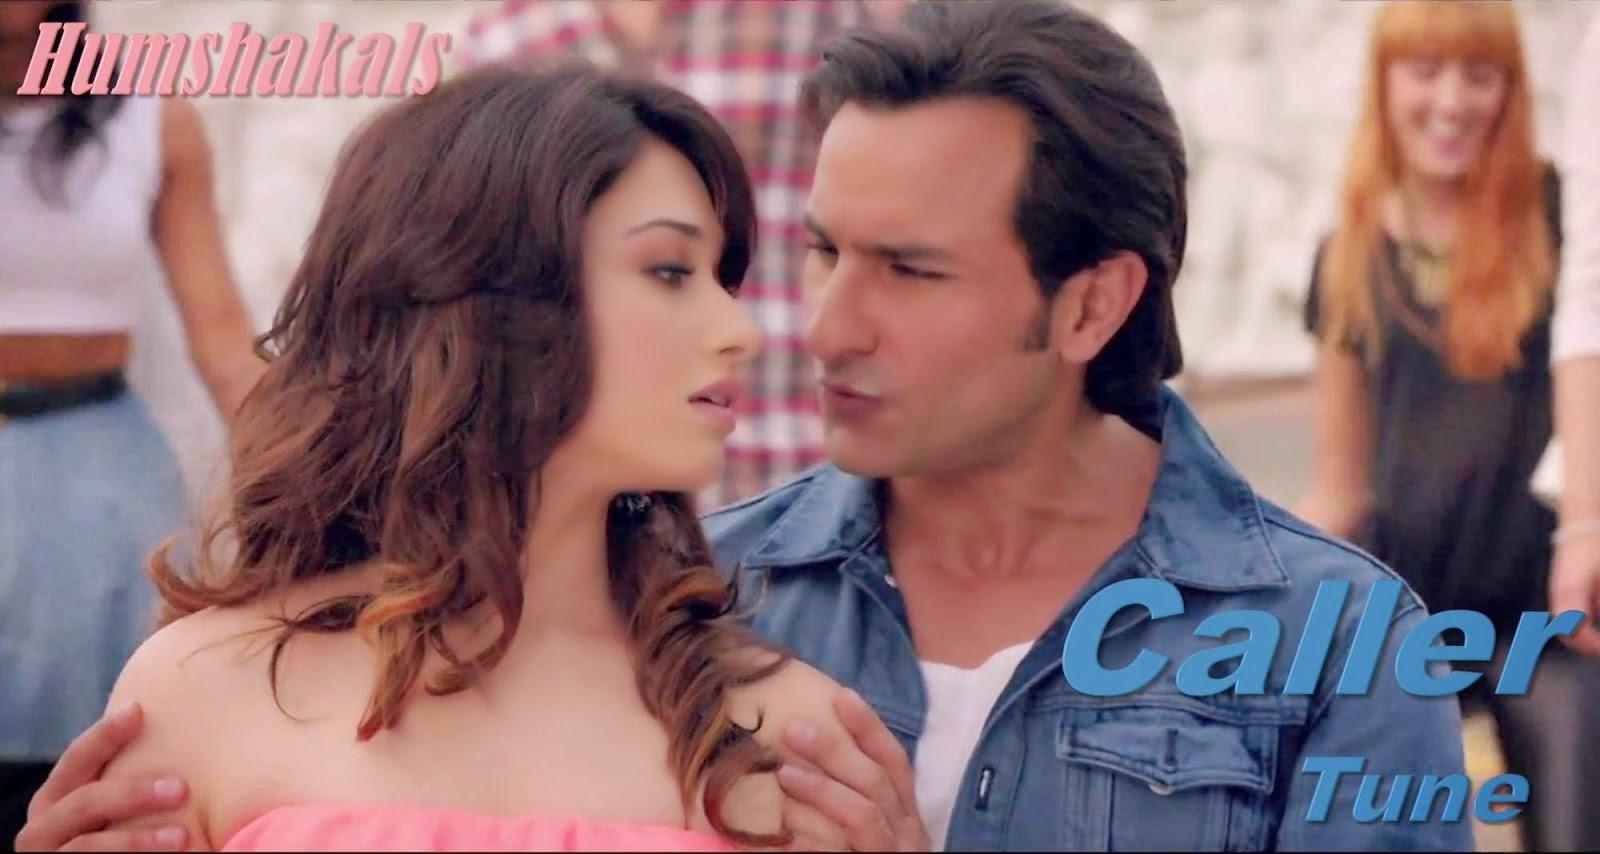 Humshakal Movie Ke Video Download Full Hd